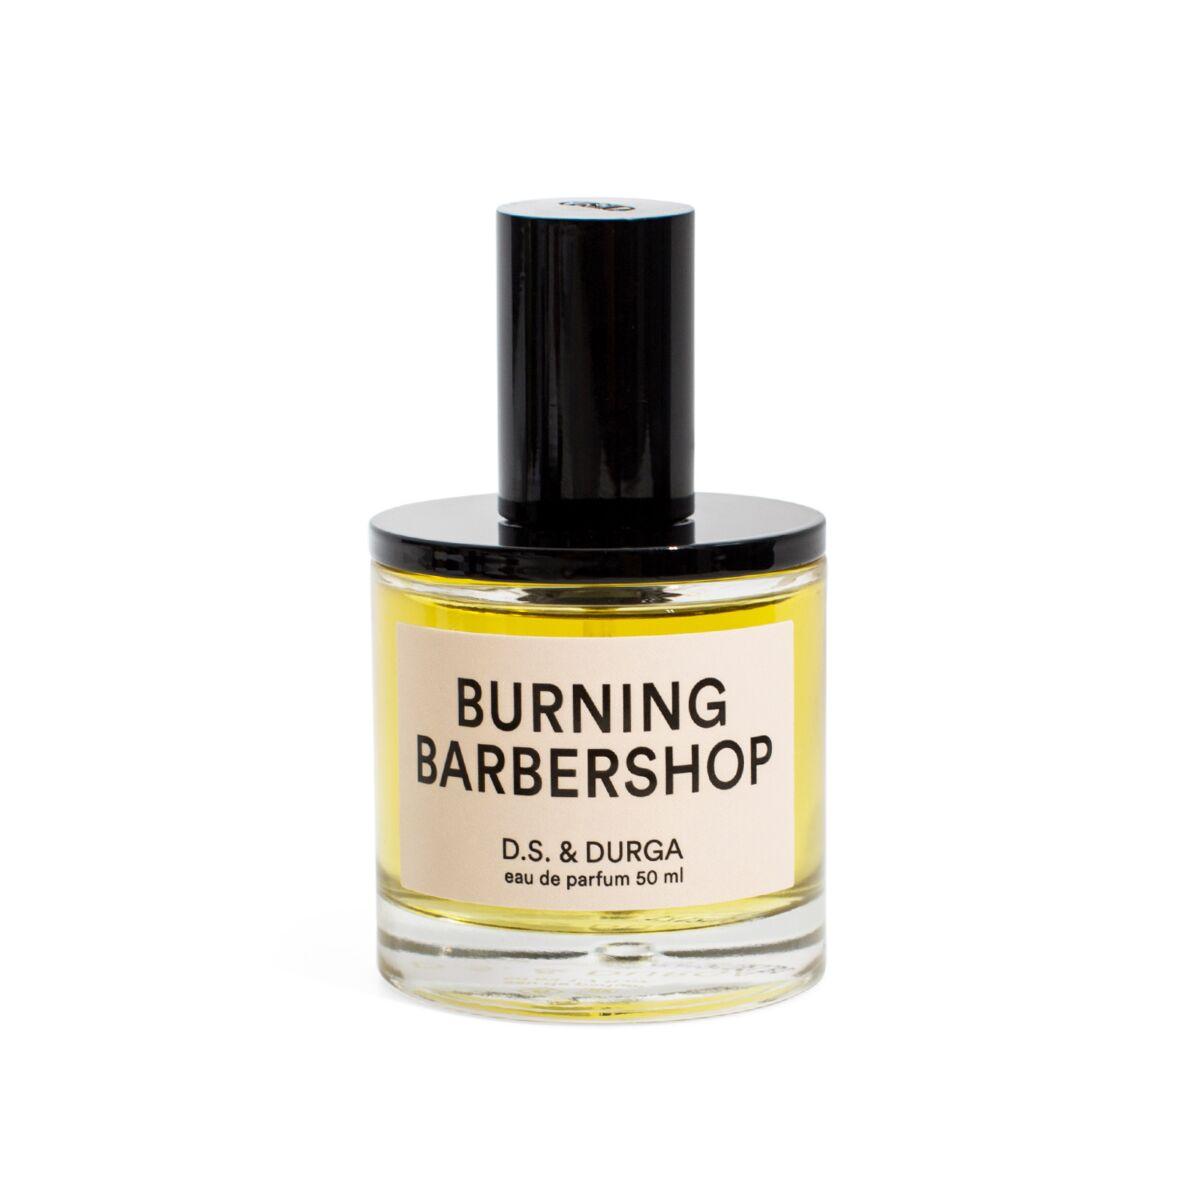 Burning Barbershop Eau de Parfum image